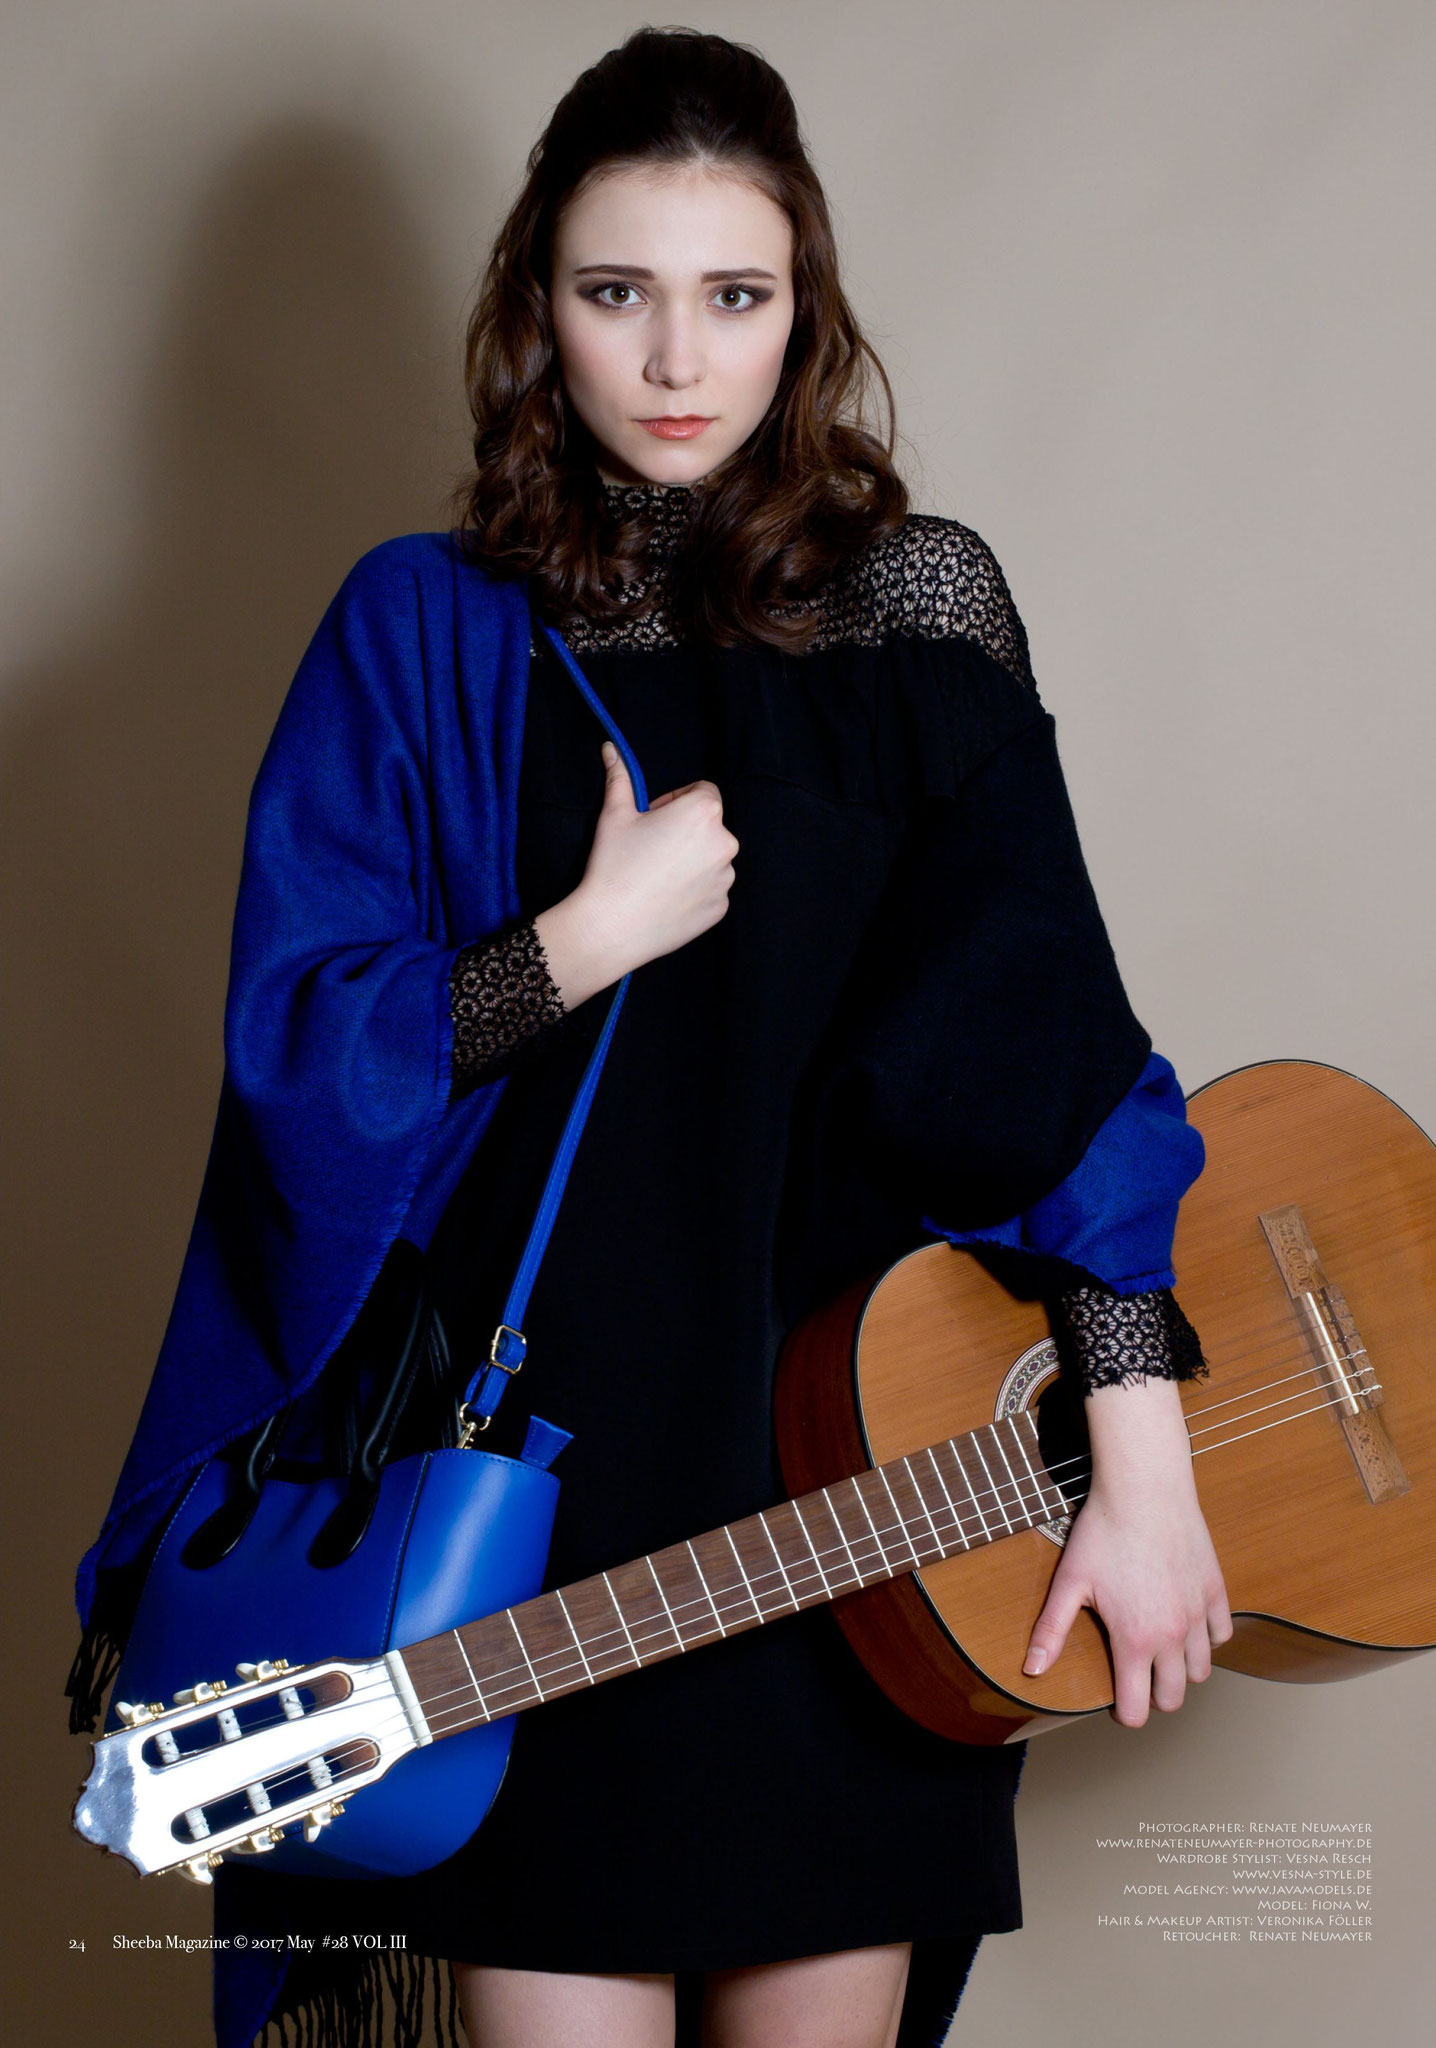 SHEEBA UK, Mai 2017 VOL III - Fashion Stylist: Vesna Resch